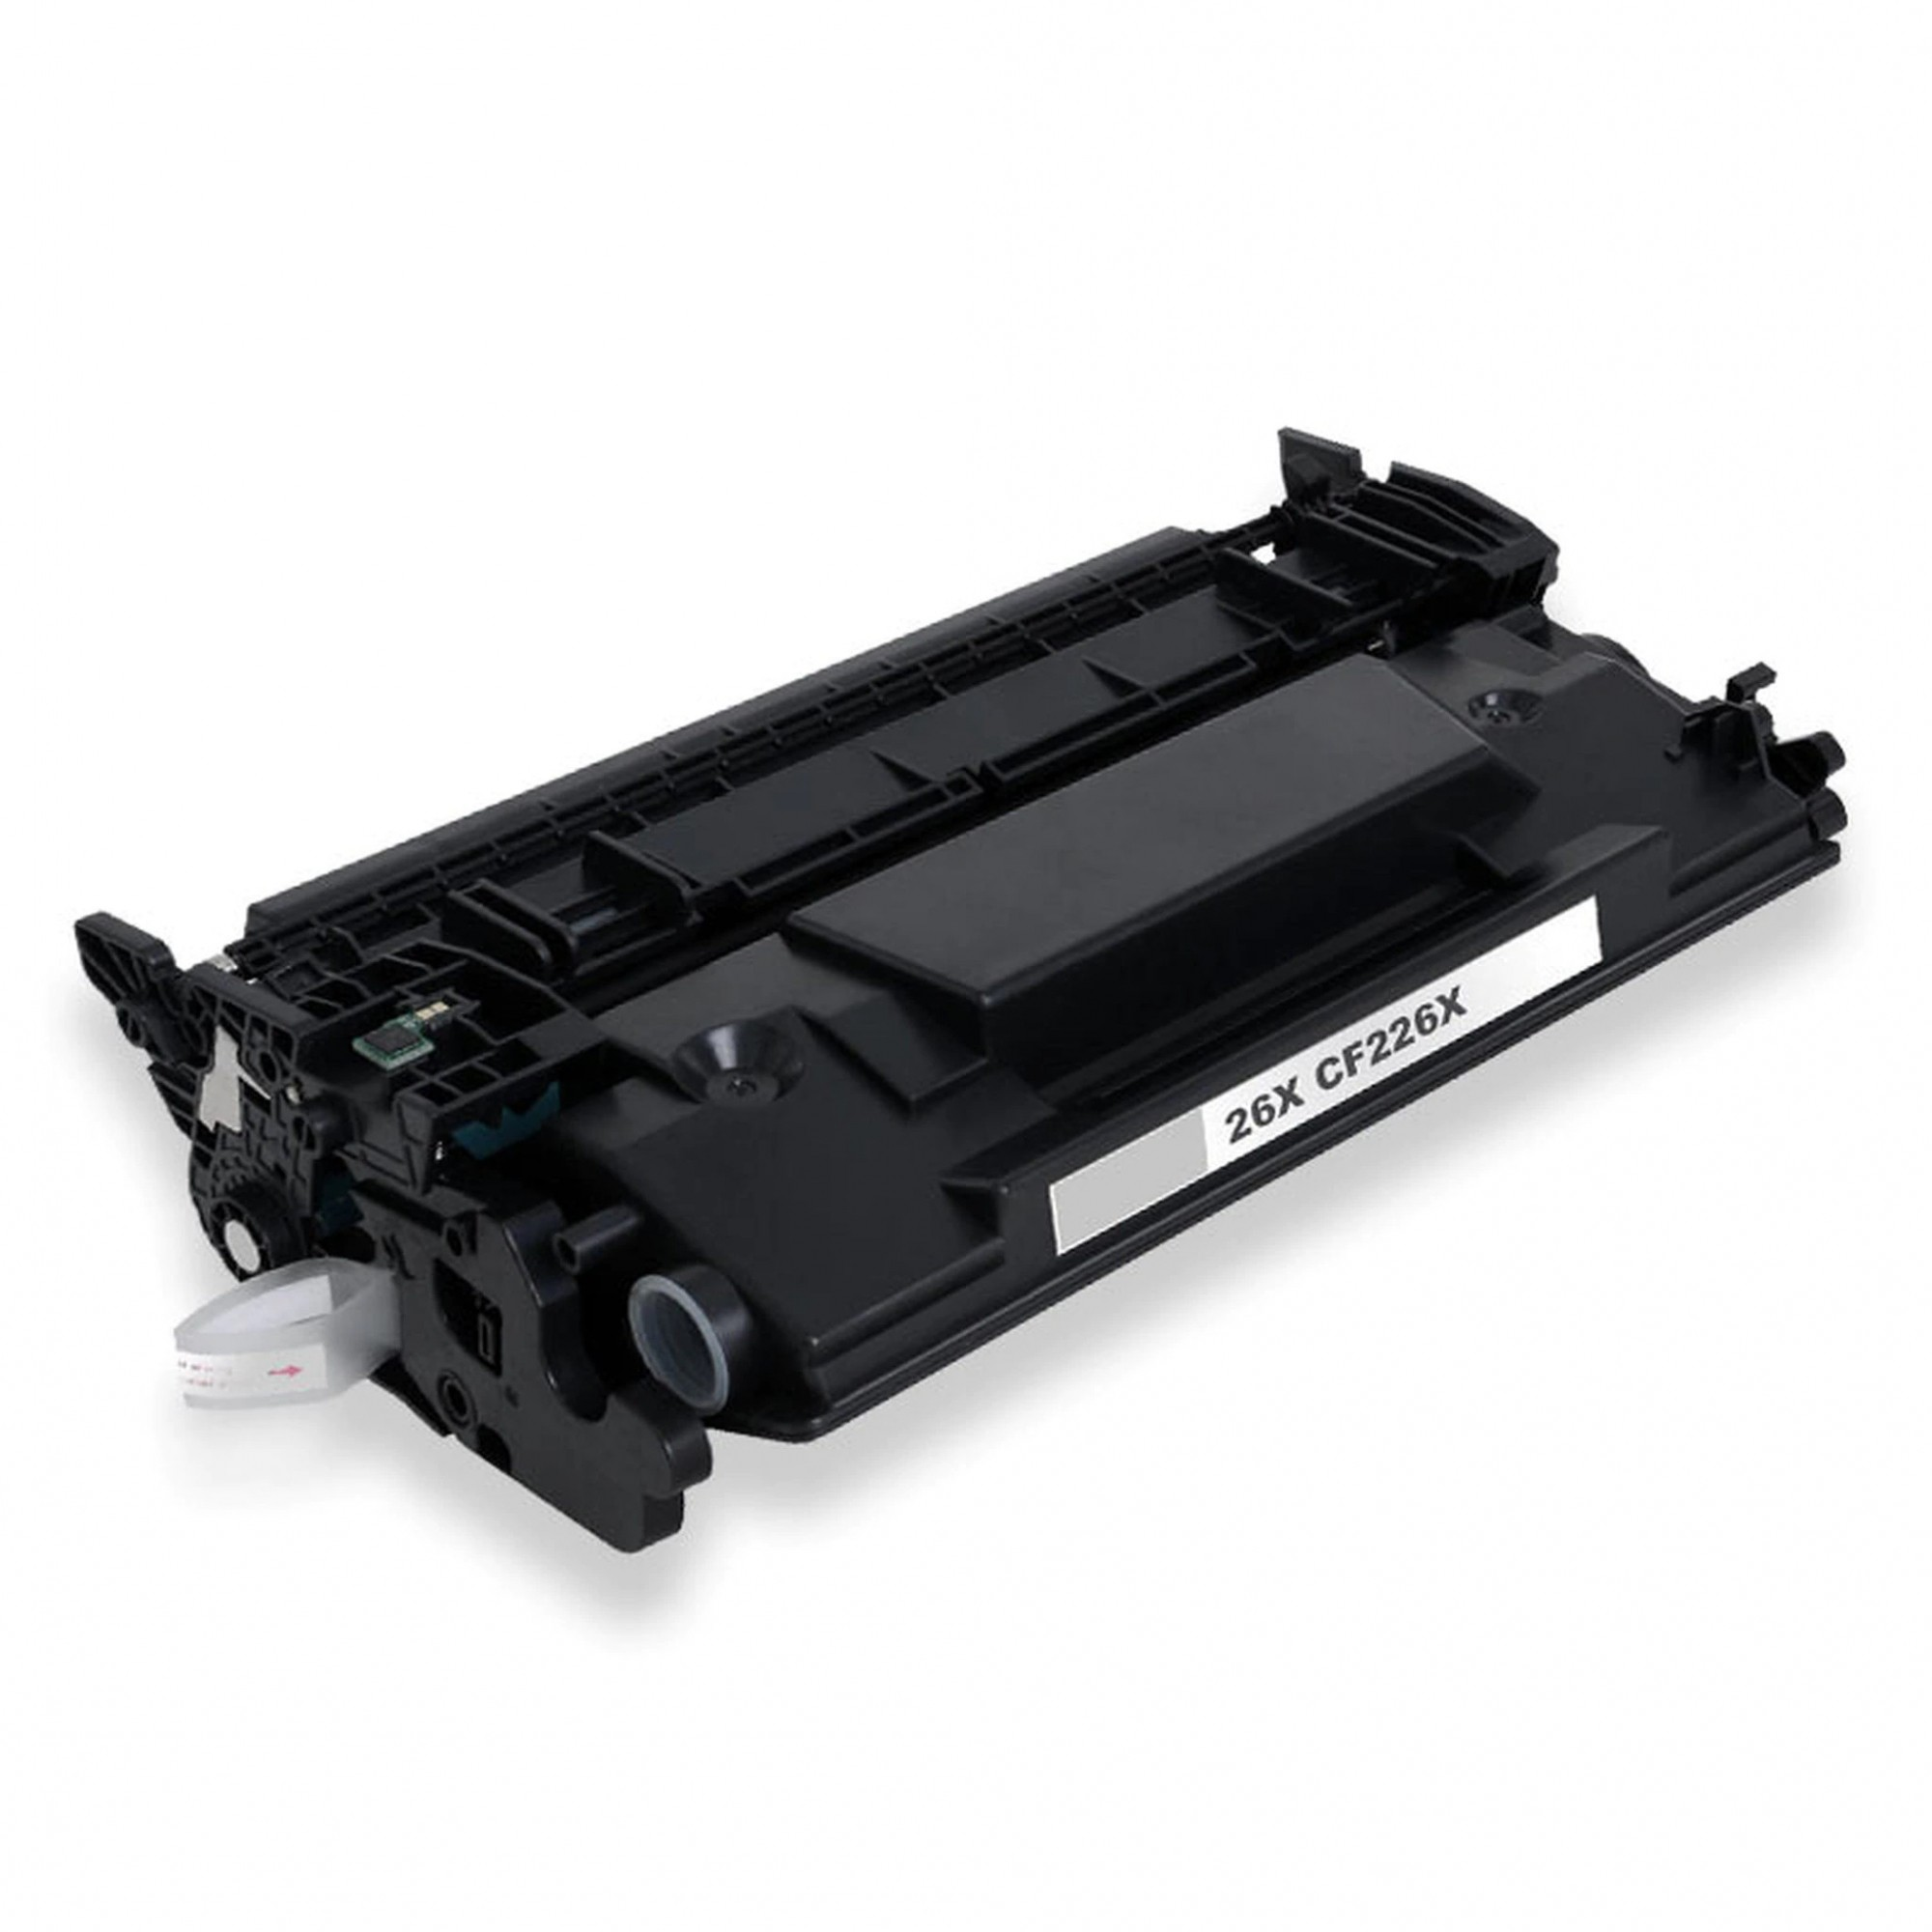 Toner Compatível com HP CF226X CF226 CF226XB M426 M402 M426FDW M426DW M402DN Premium Quality 9K